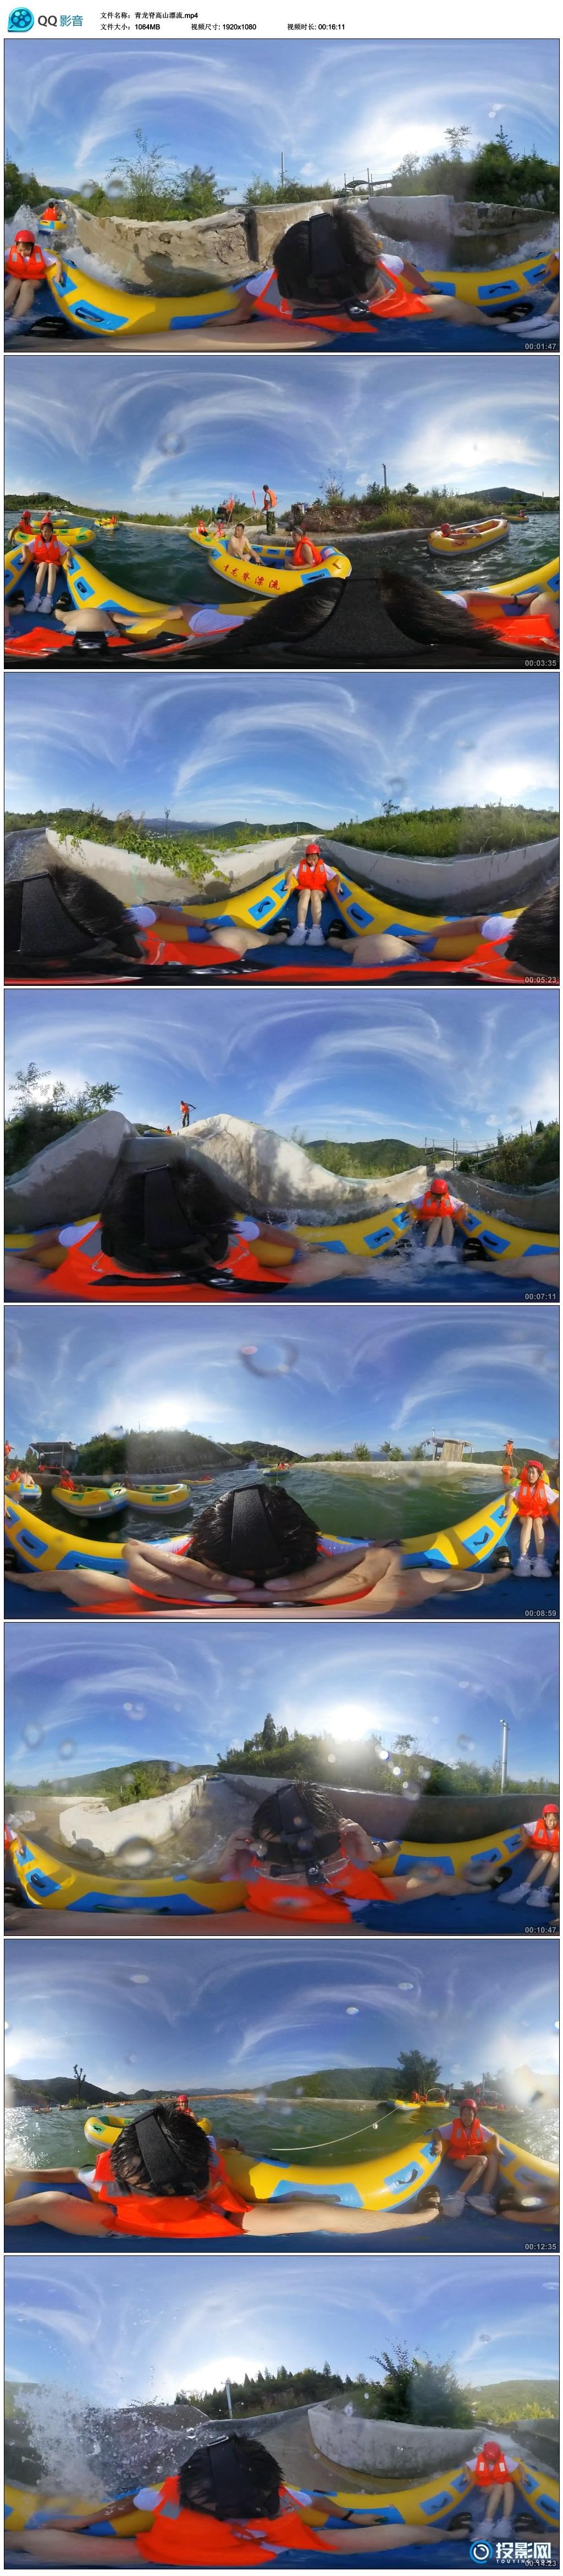 [VR360°全景] 青龙脊高山漂流 VR视频下载